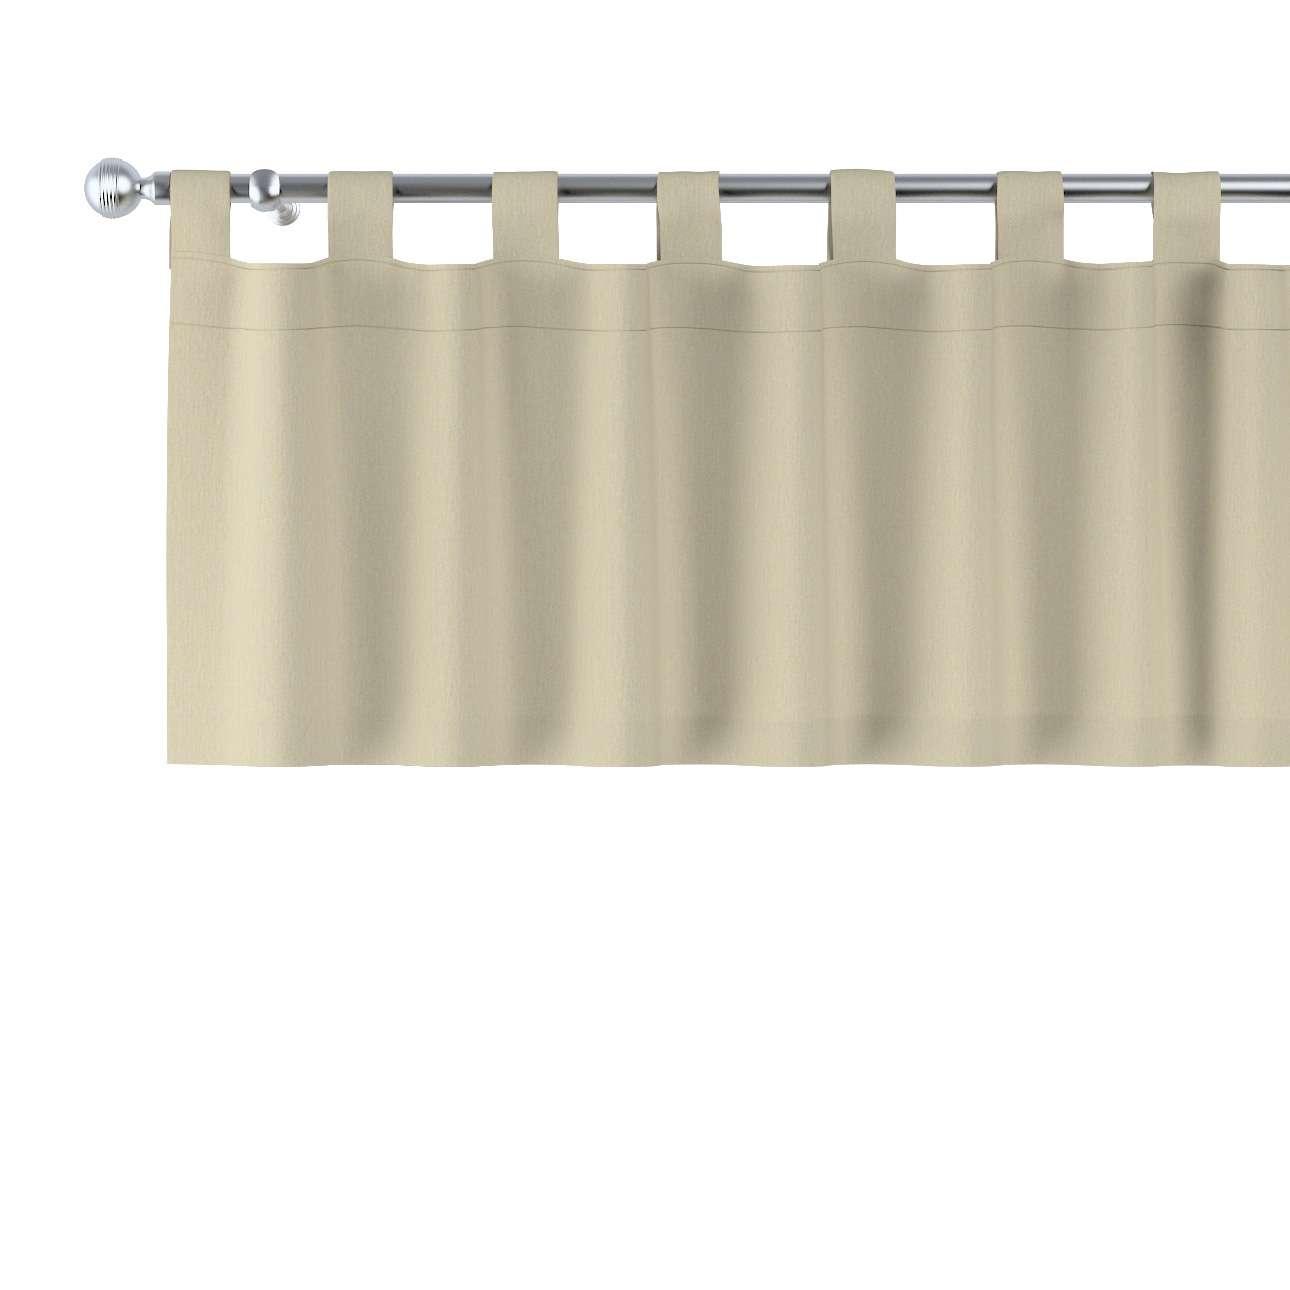 Lambrekin na szelkach 130x40cm w kolekcji Chenille, tkanina: 702-22